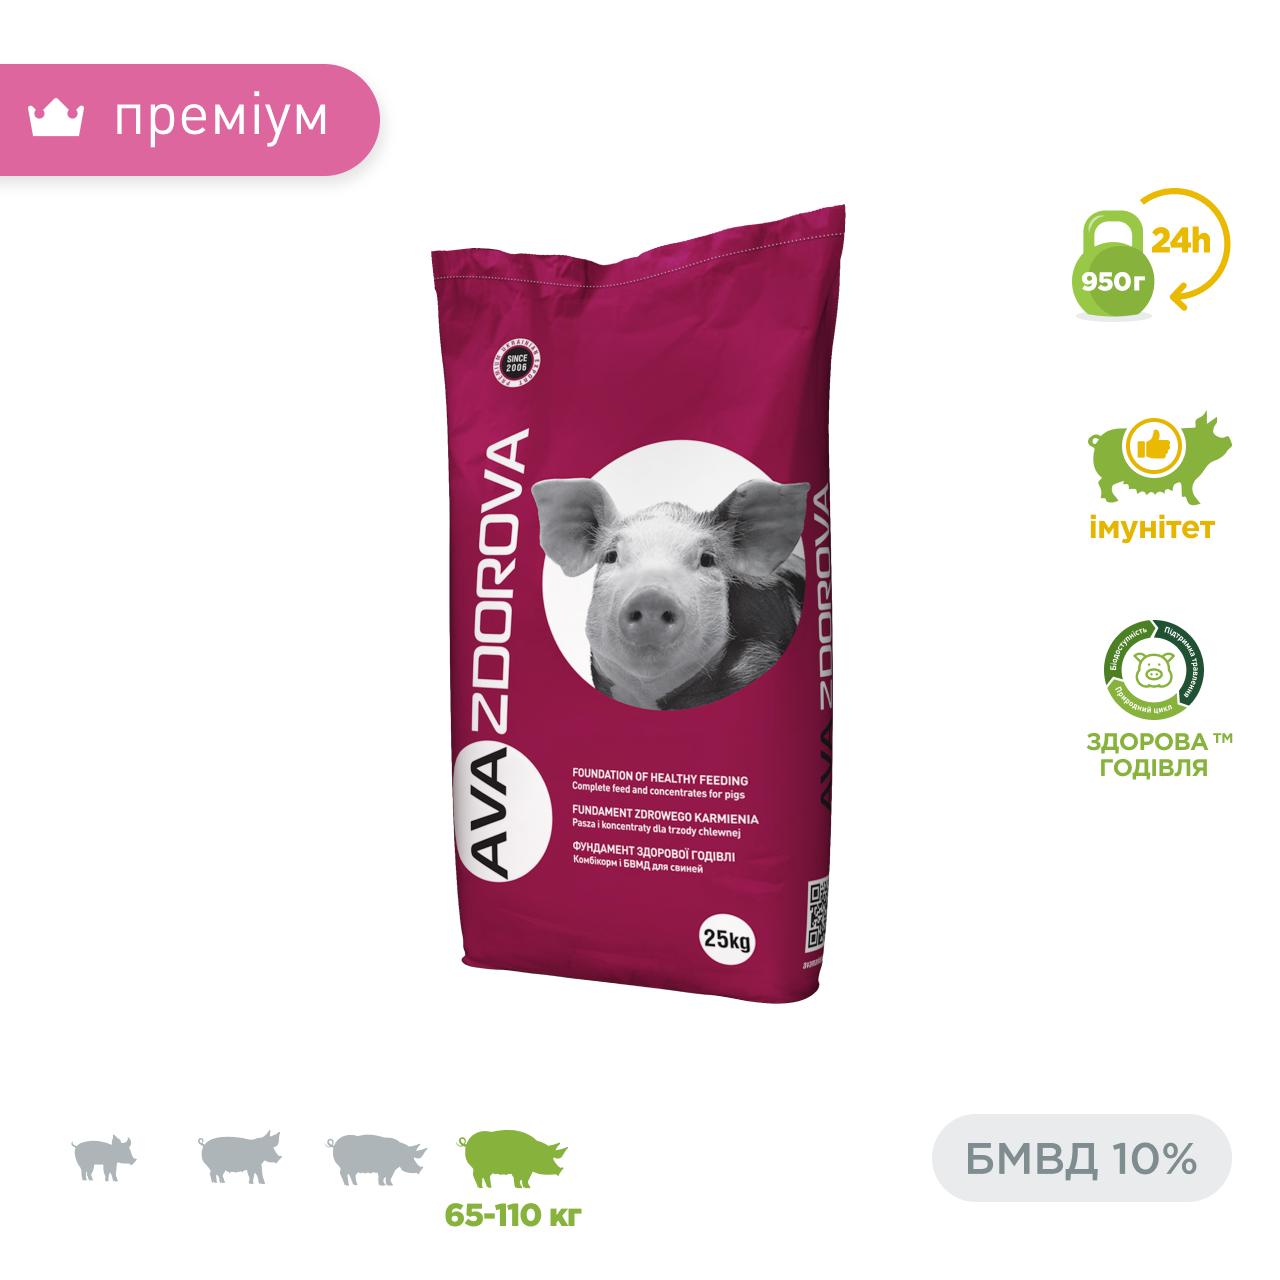 БМВД для свиней от 65кг. AVA ZDOROVA (Здорова) Финиш 10%